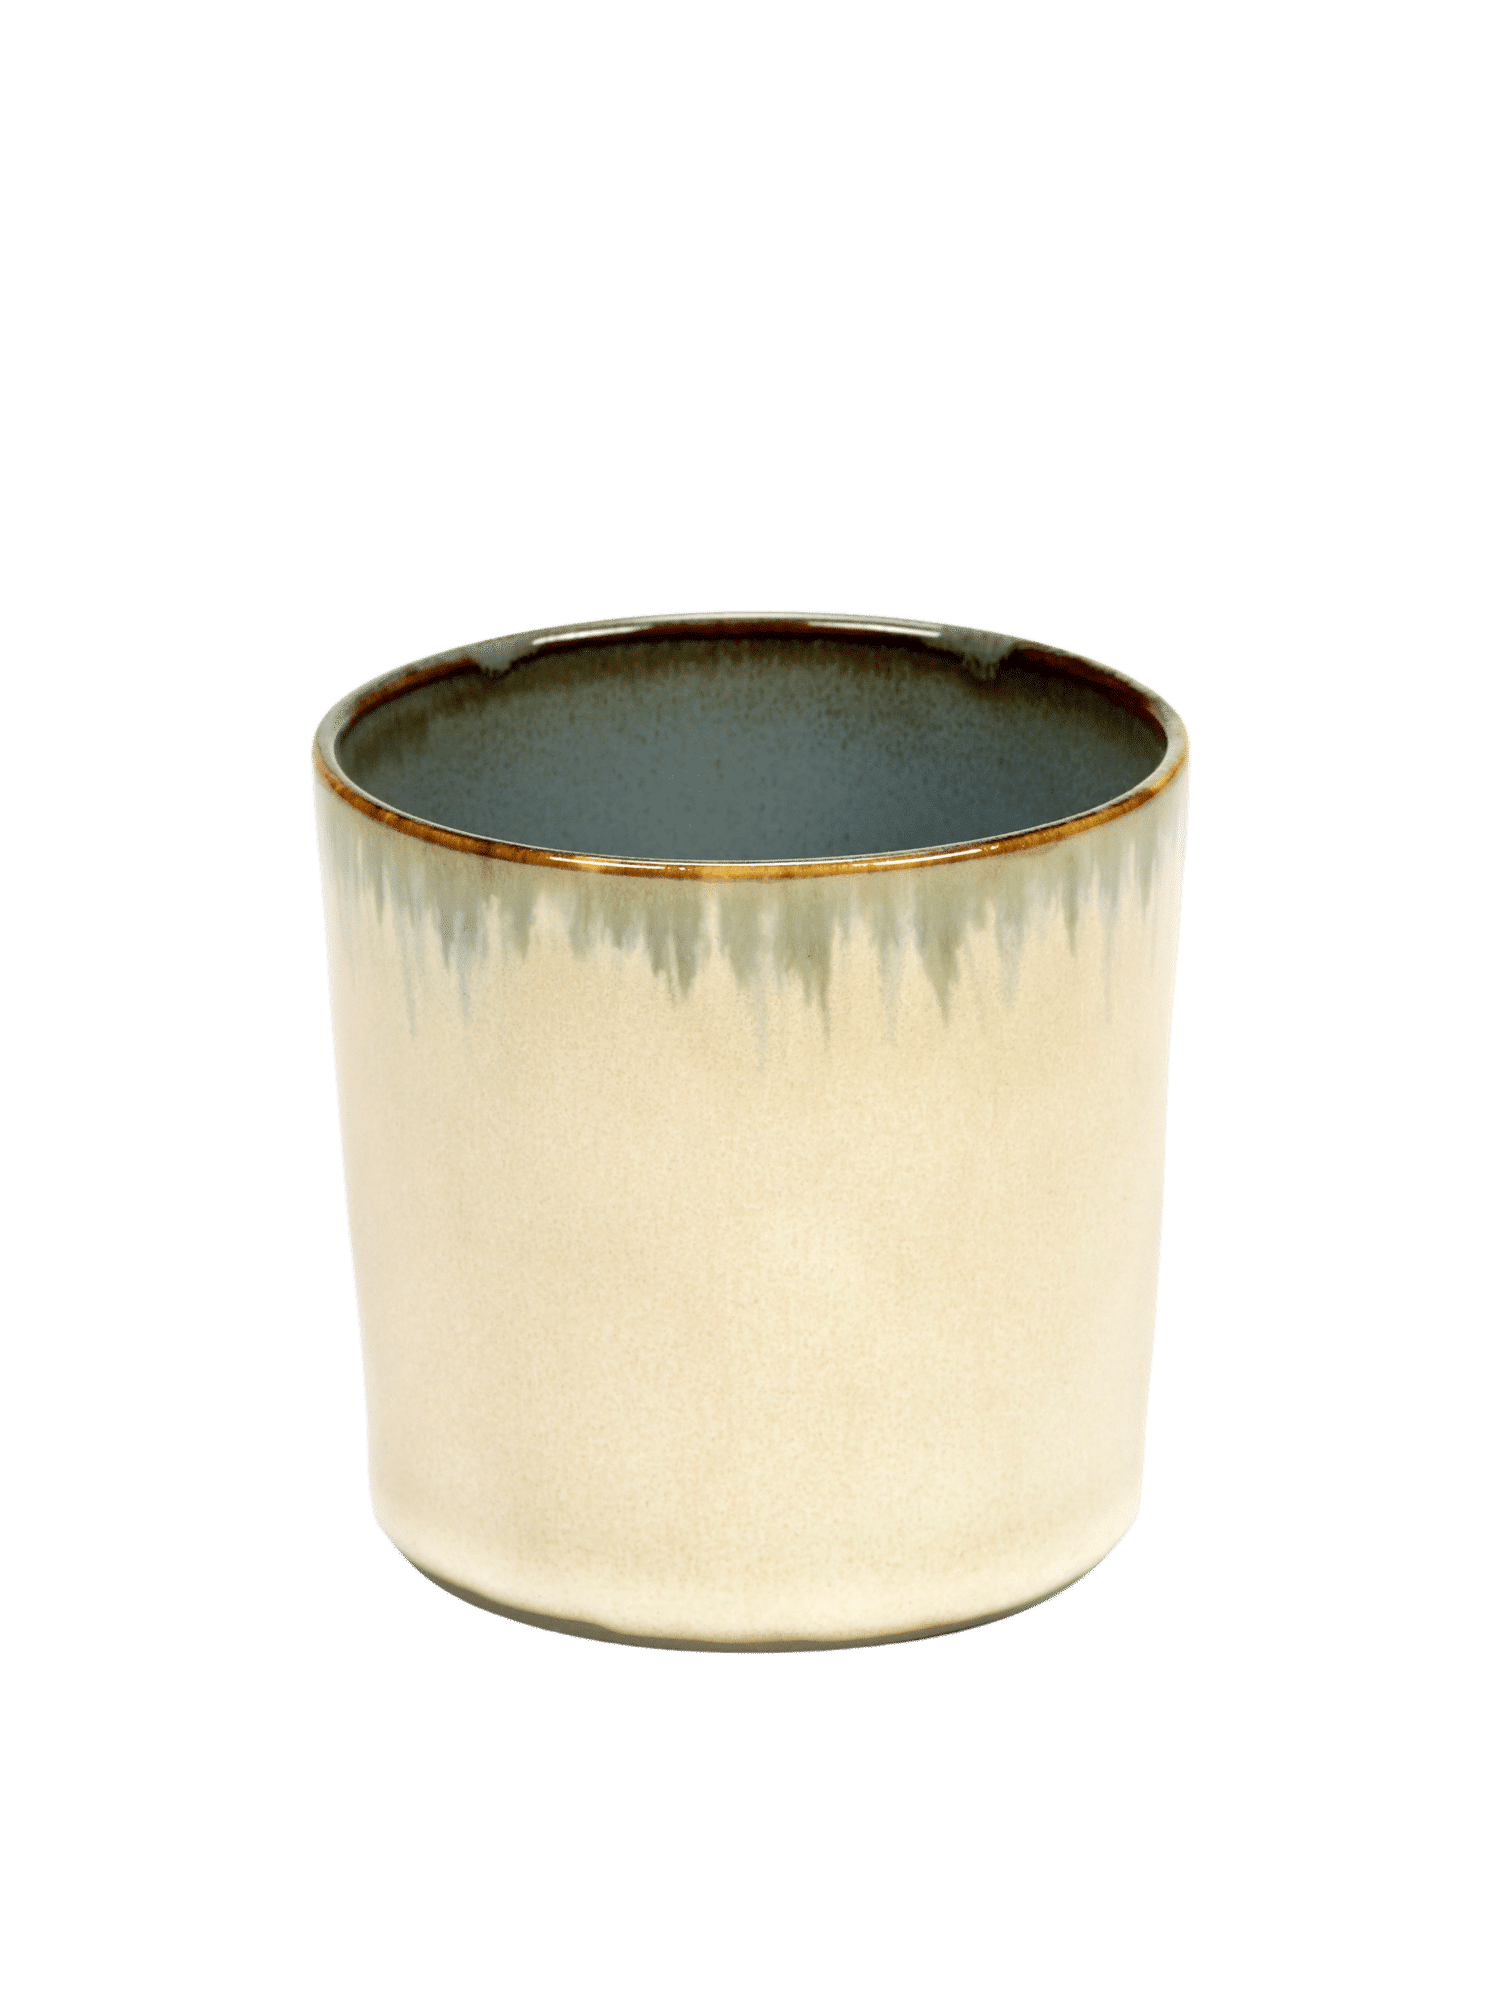 ANITA LE GRELLE - SERAX - ANITA LE GRELLE –  Becher Zylinder Hoch, Misty Grey/Smokey Blue - D7,5 x H7,5 CM